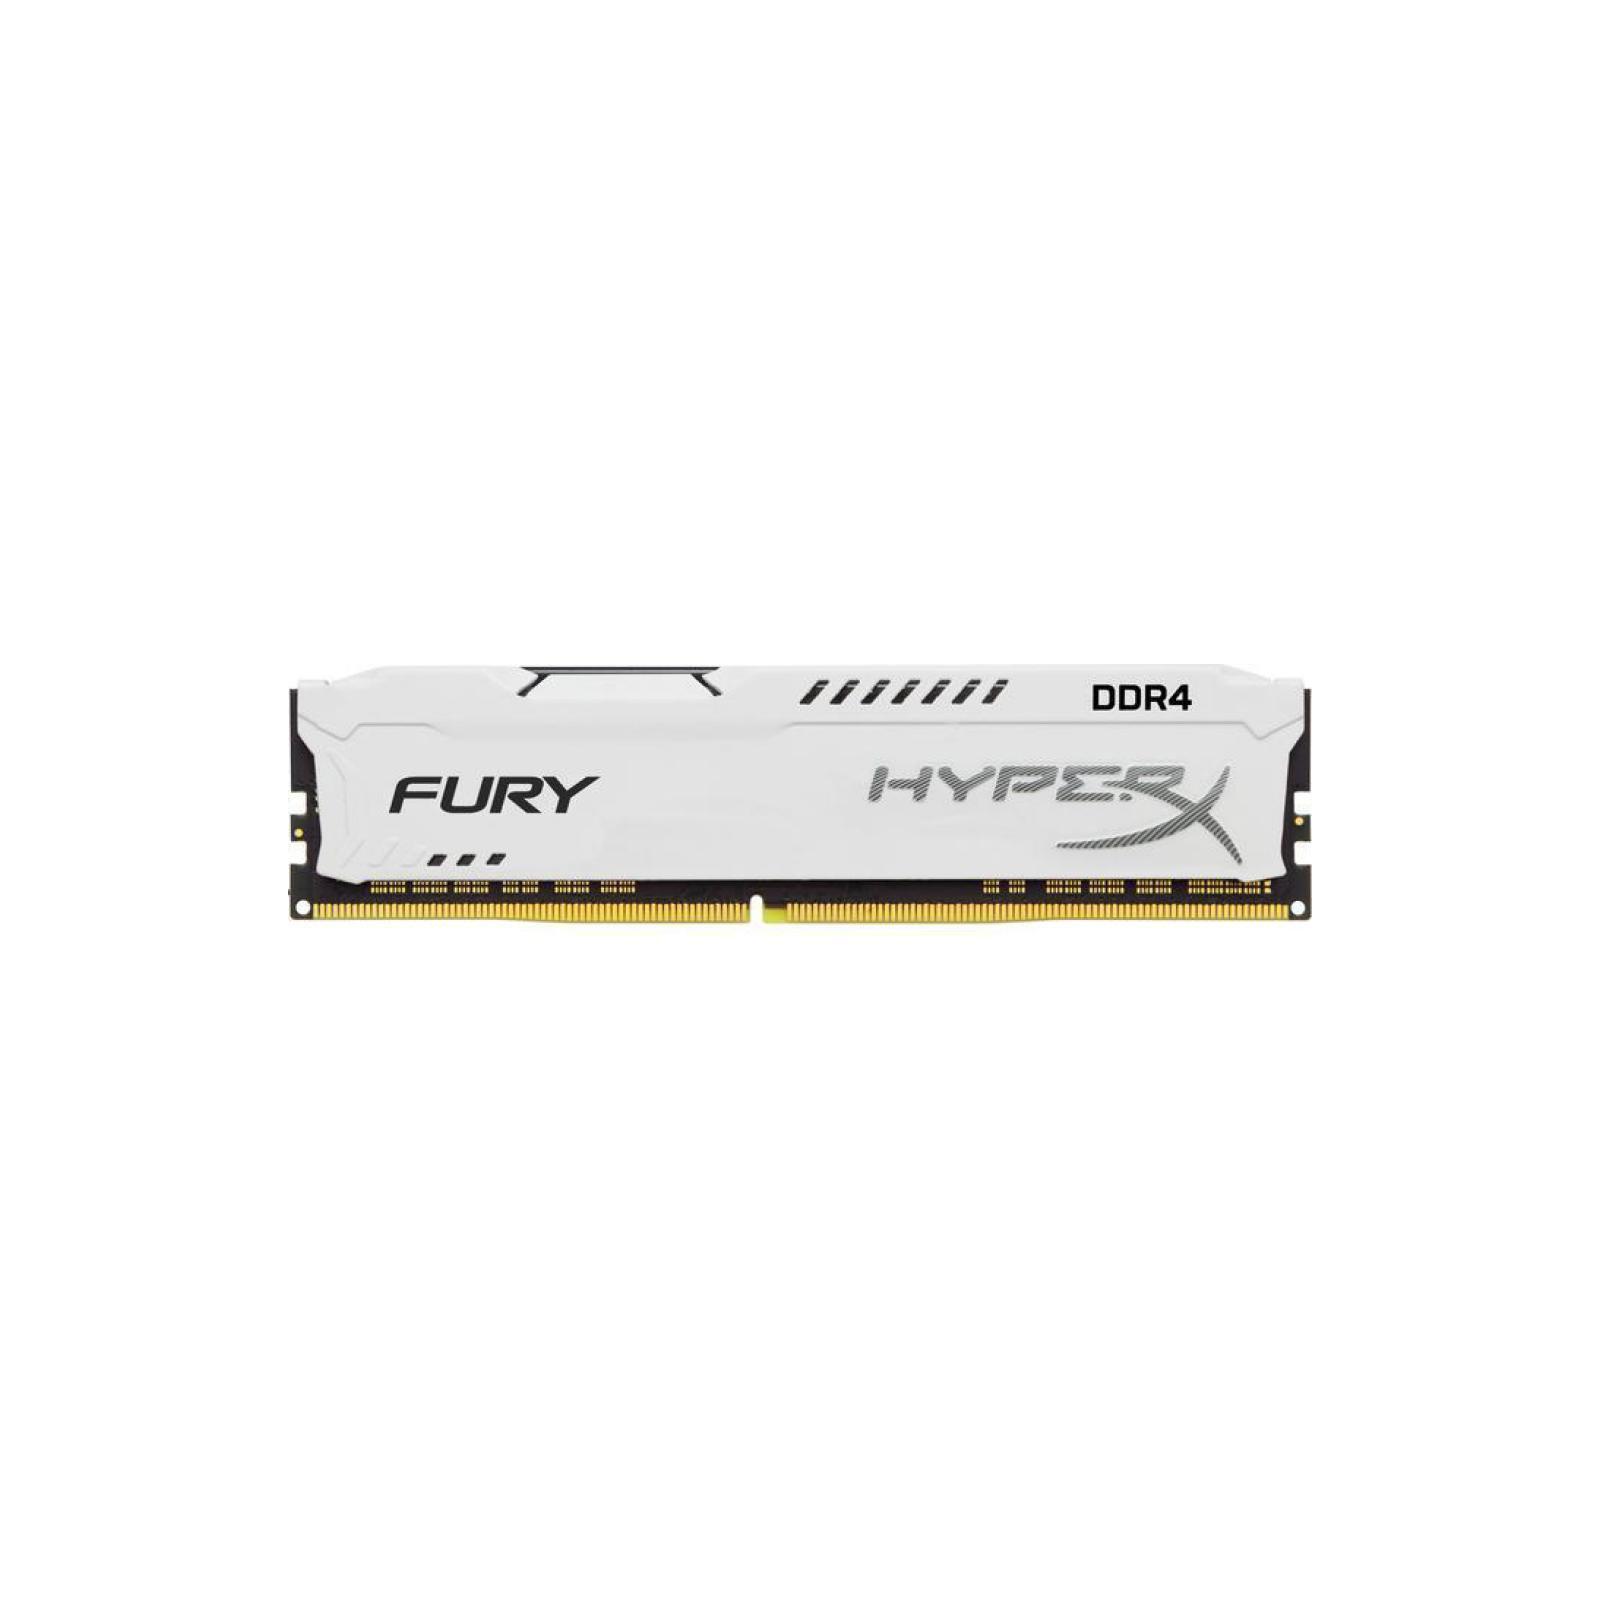 Модуль памяти для компьютера DDR4 8GB 3466 MHz HyperX FURY White HyperX (Kingston Fury) (HX434C19FW2/8)